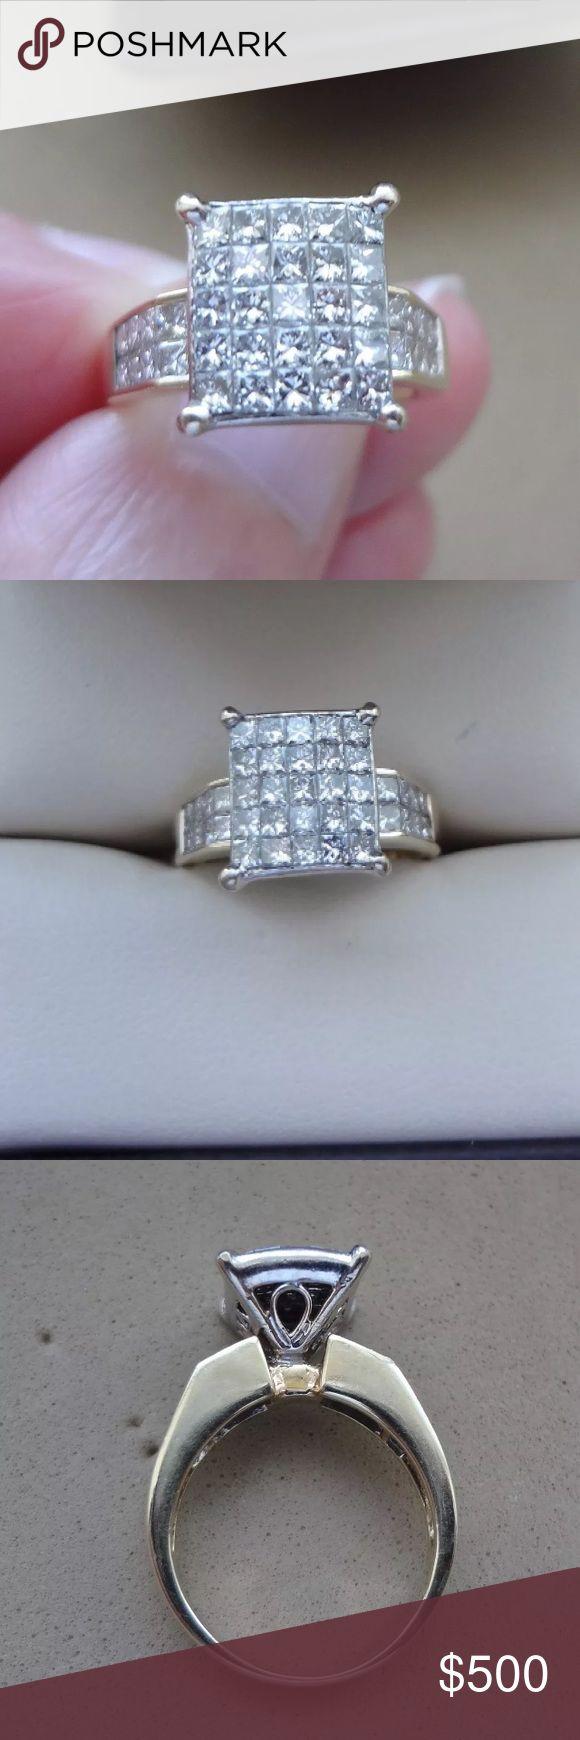 Gorgeous 1.10 carat 14k yellow gold diamond ring Gorgeous 1.10 carat 14k yellow gold diamond ring Jewelry Rings